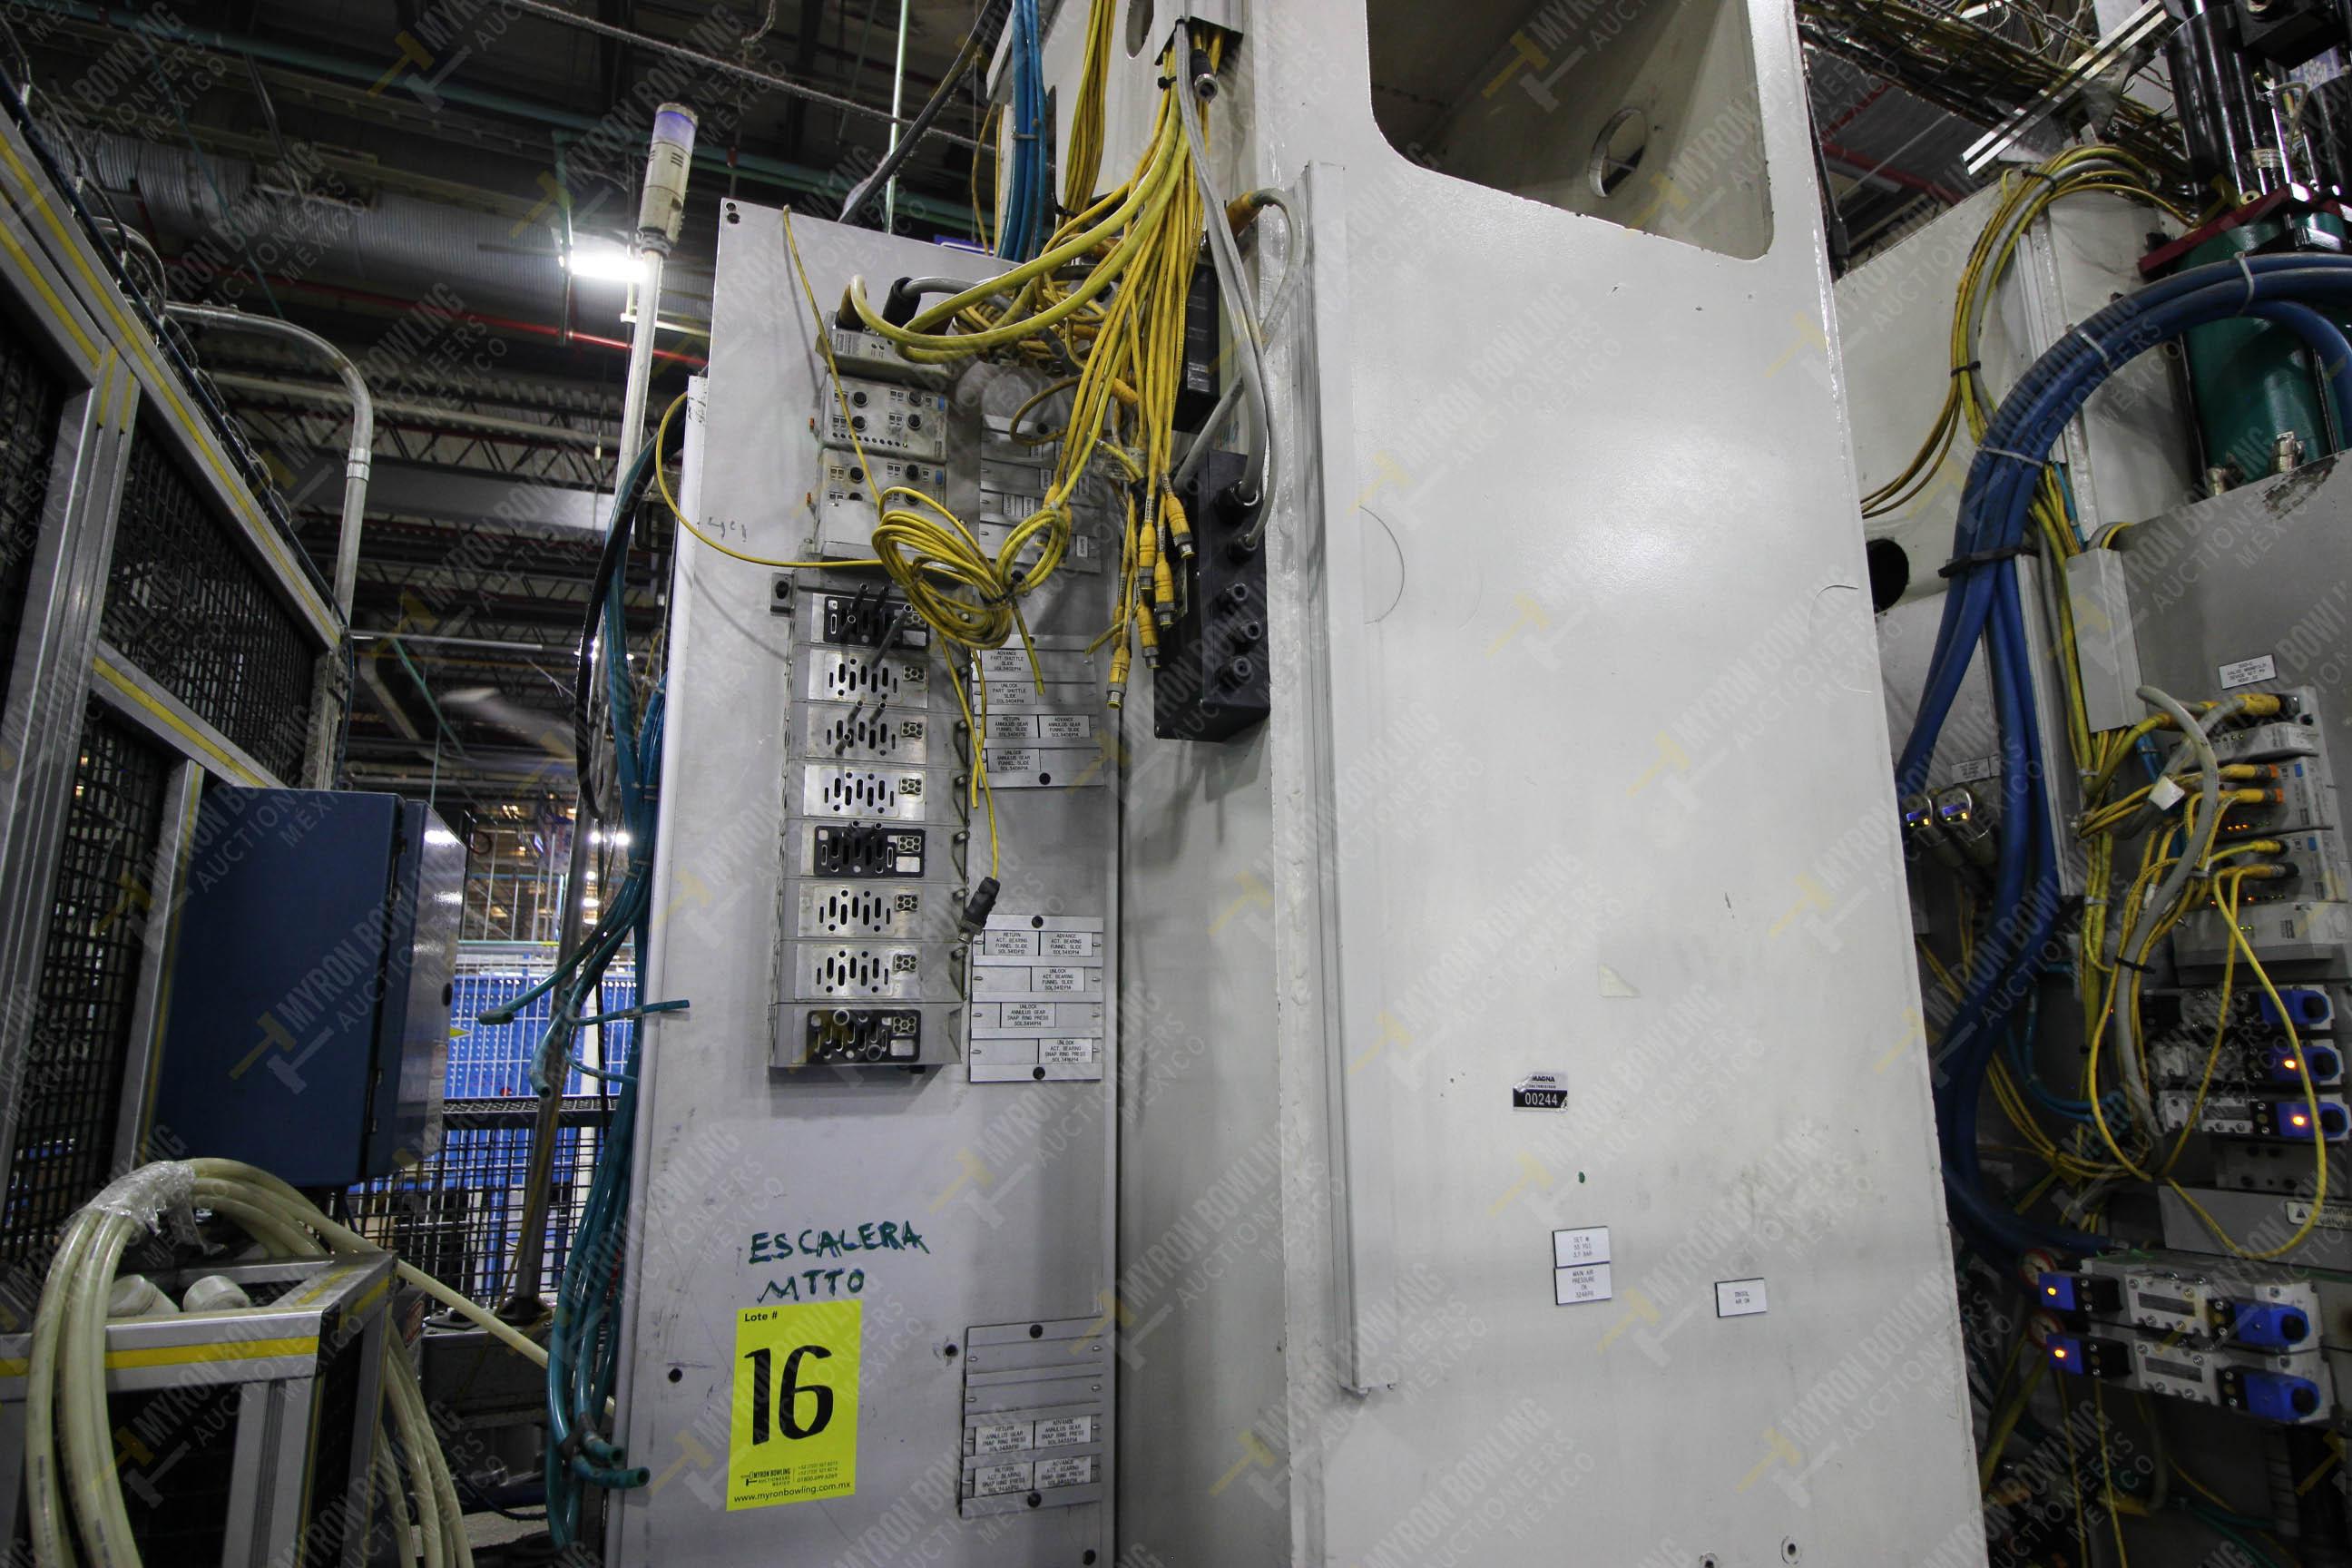 Estación semiautomática para operación 305D, contiene: Prensa tipo cuello de ganso con dos cilindros - Image 13 of 20